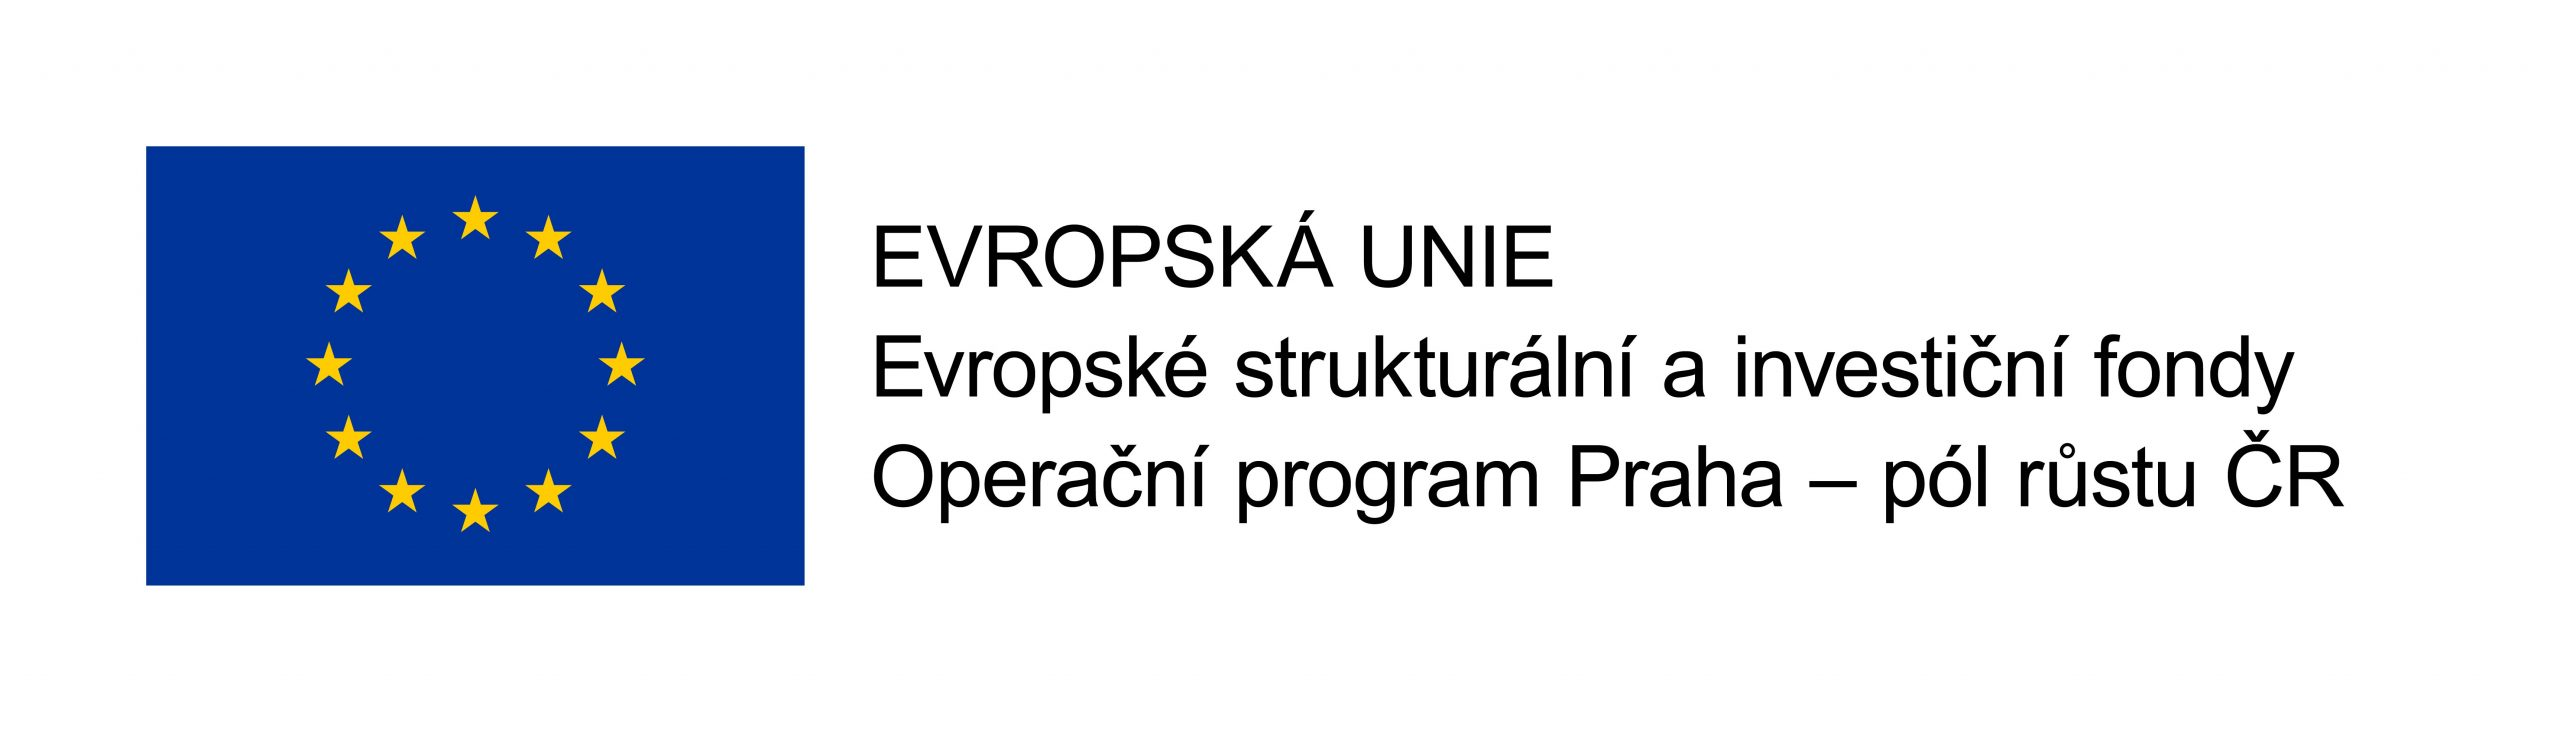 EU projekty